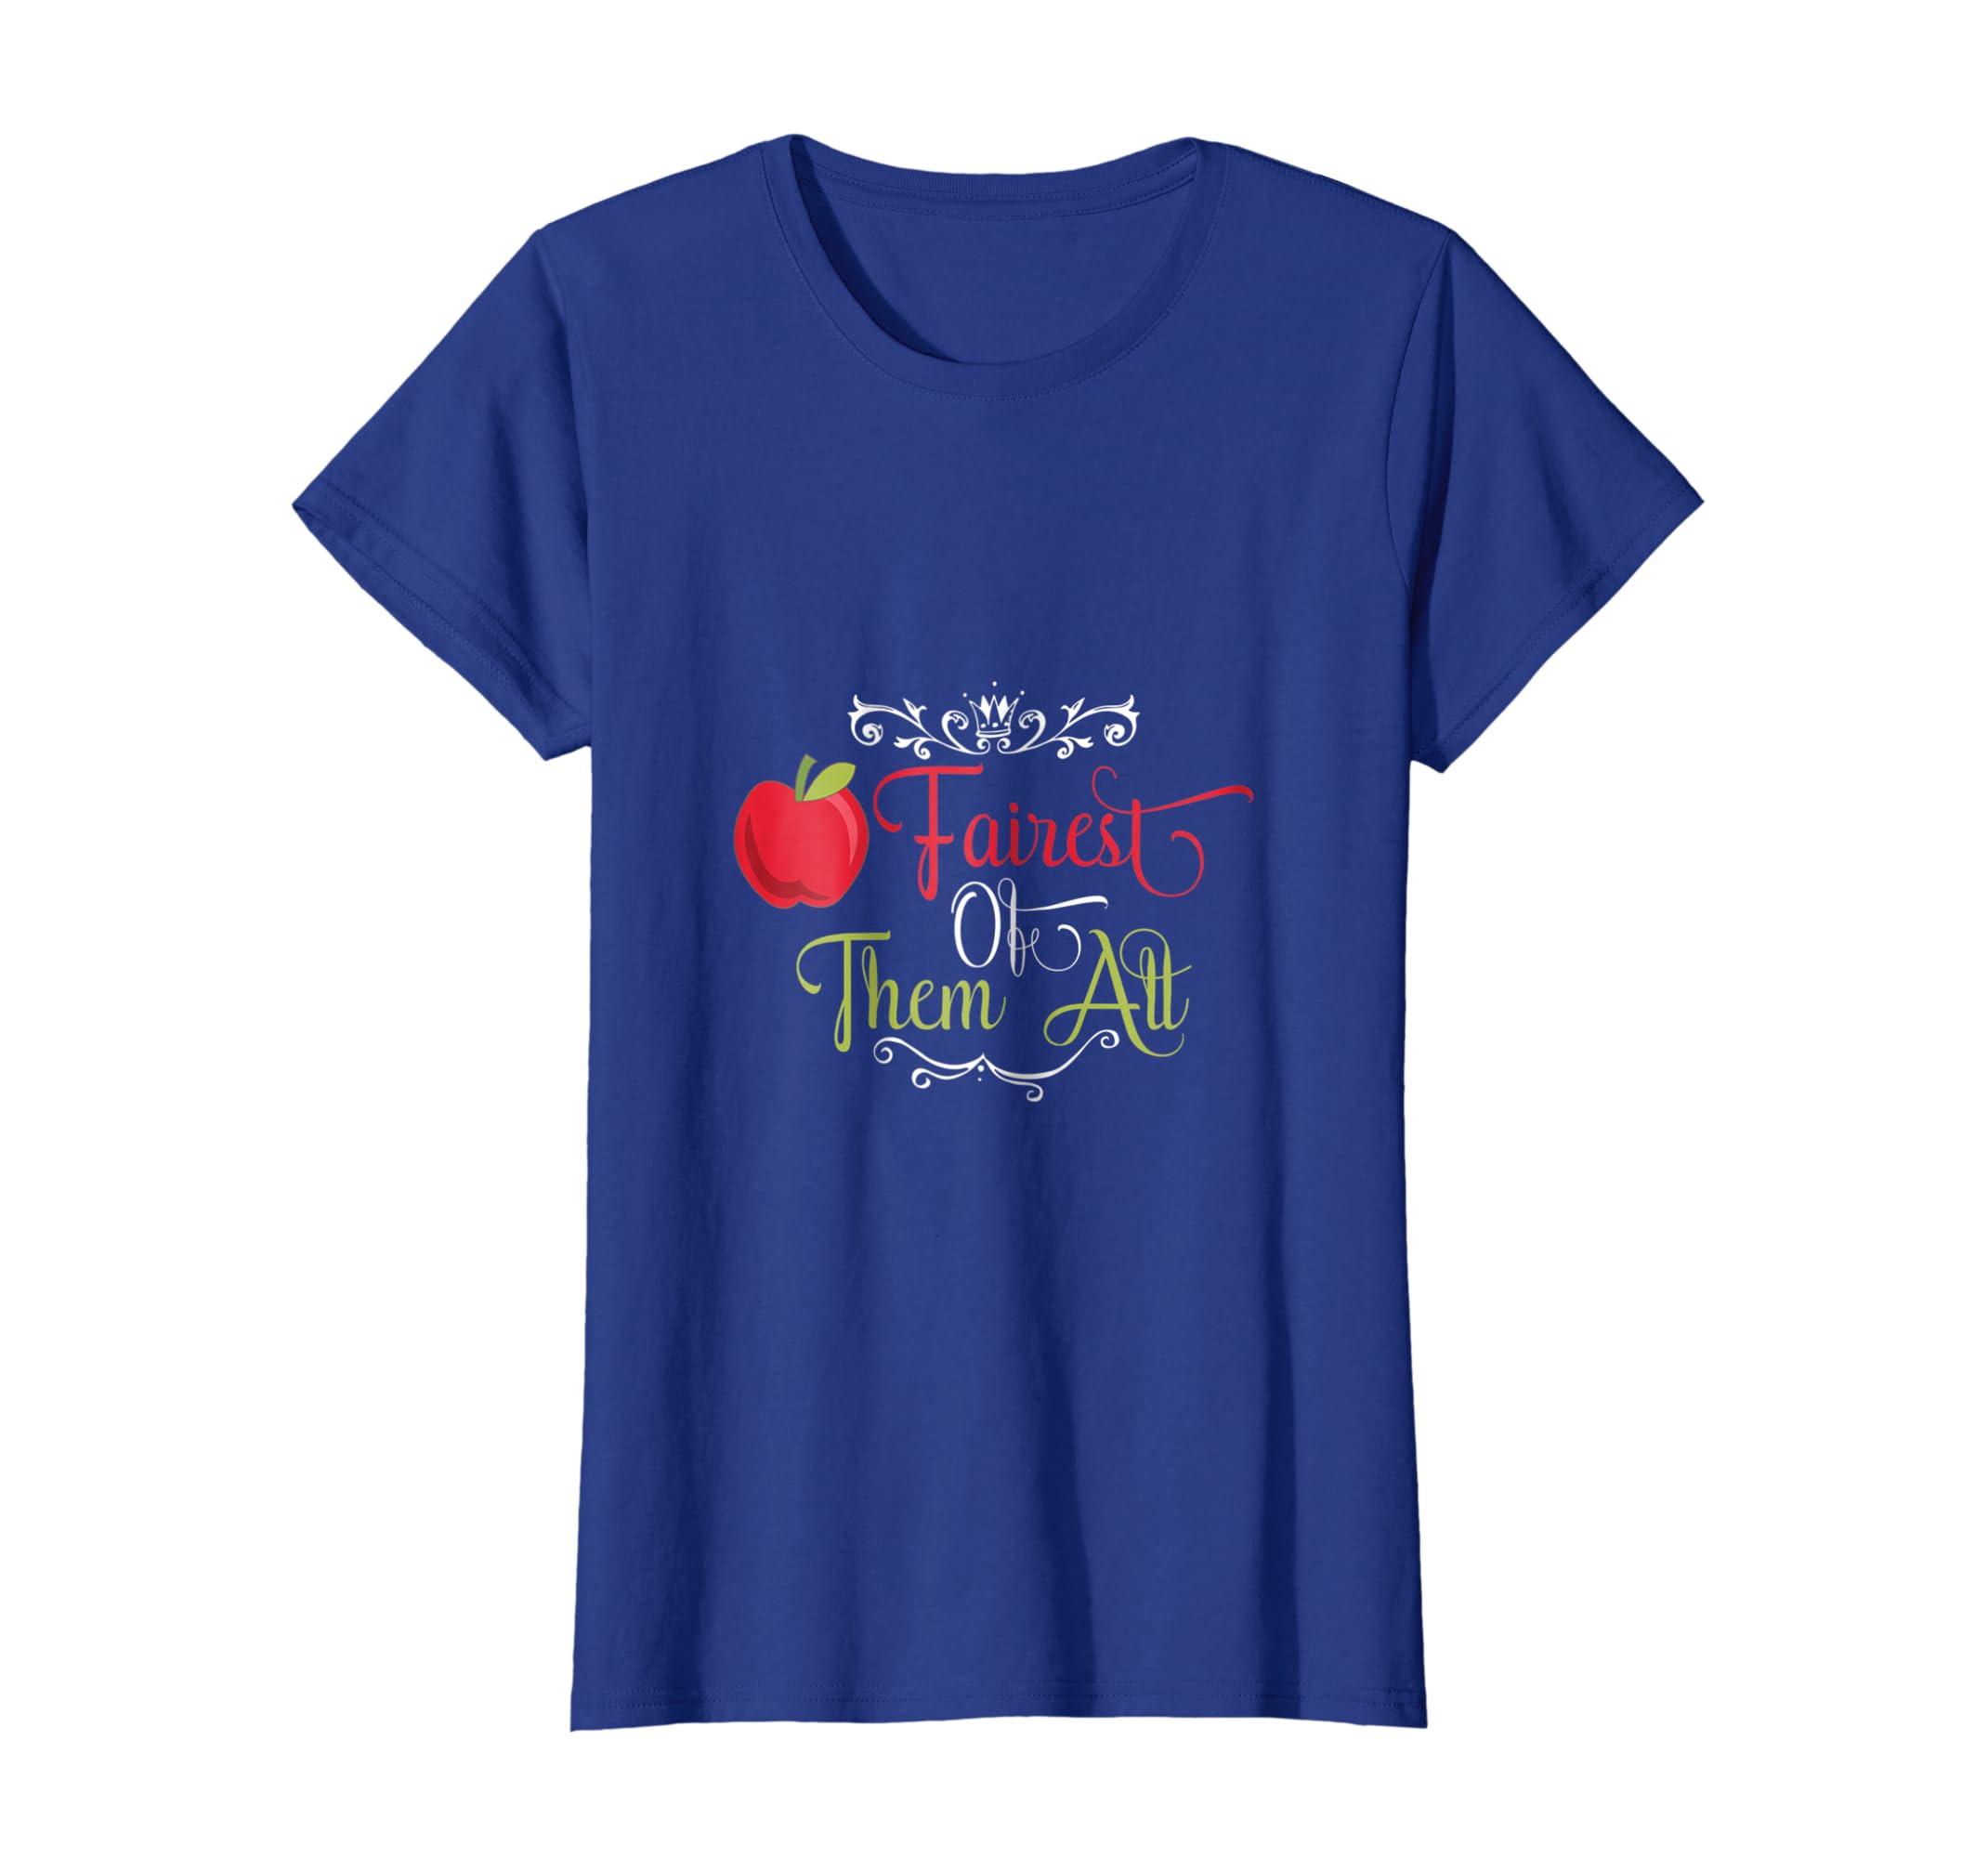 424b3f59 Amazon.com: Fairest Of Them All T-shirt: Clothing